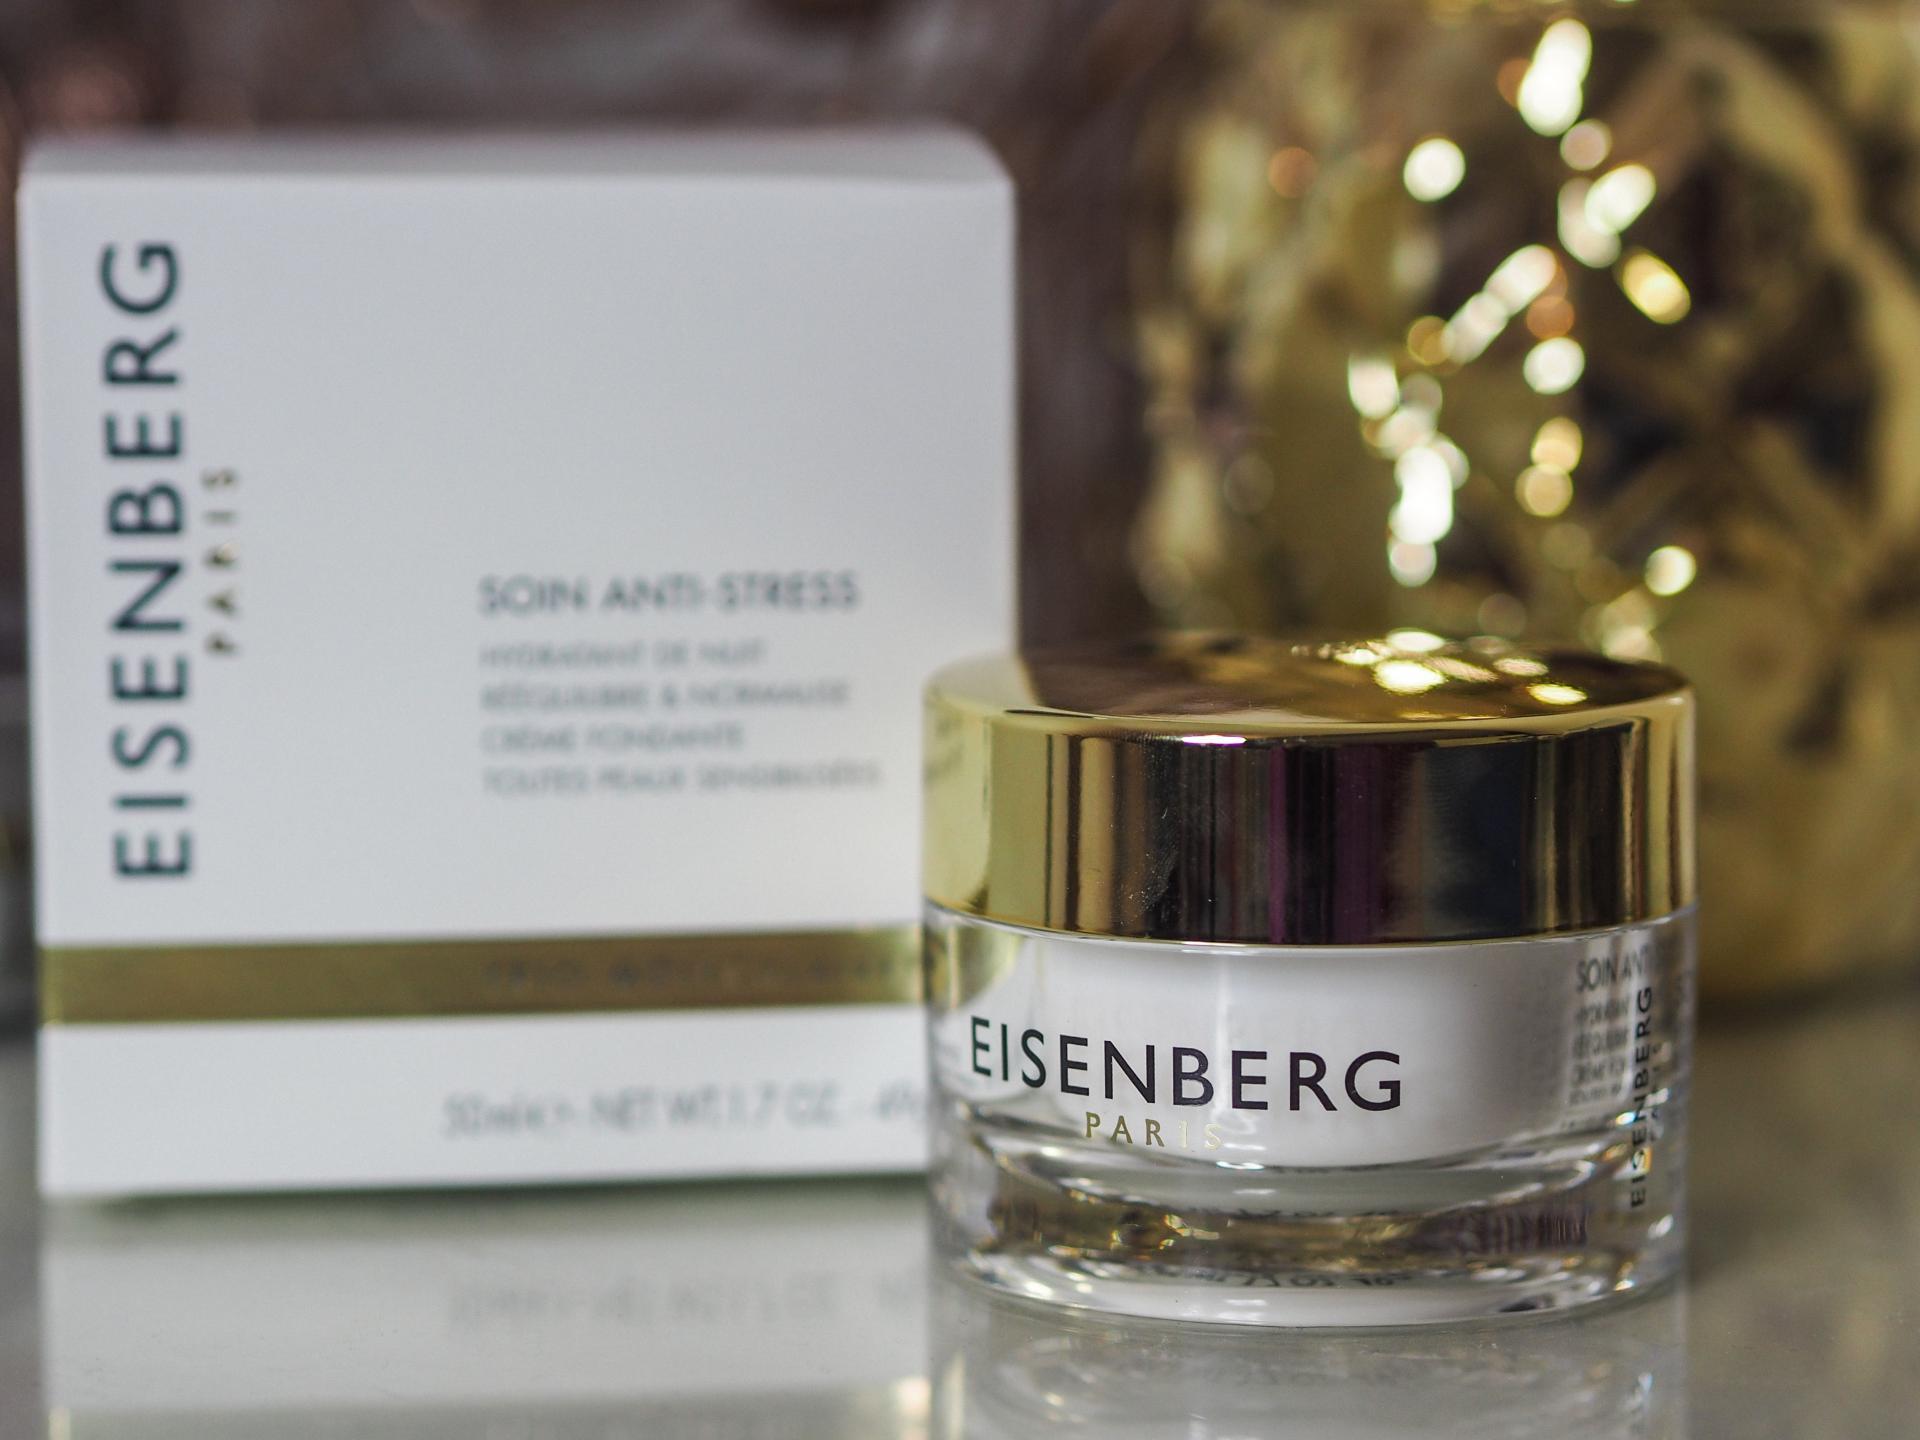 Eisenberg Anti-Stress Treatment & Night Cream Review - Rachel Nicole UK Blogger